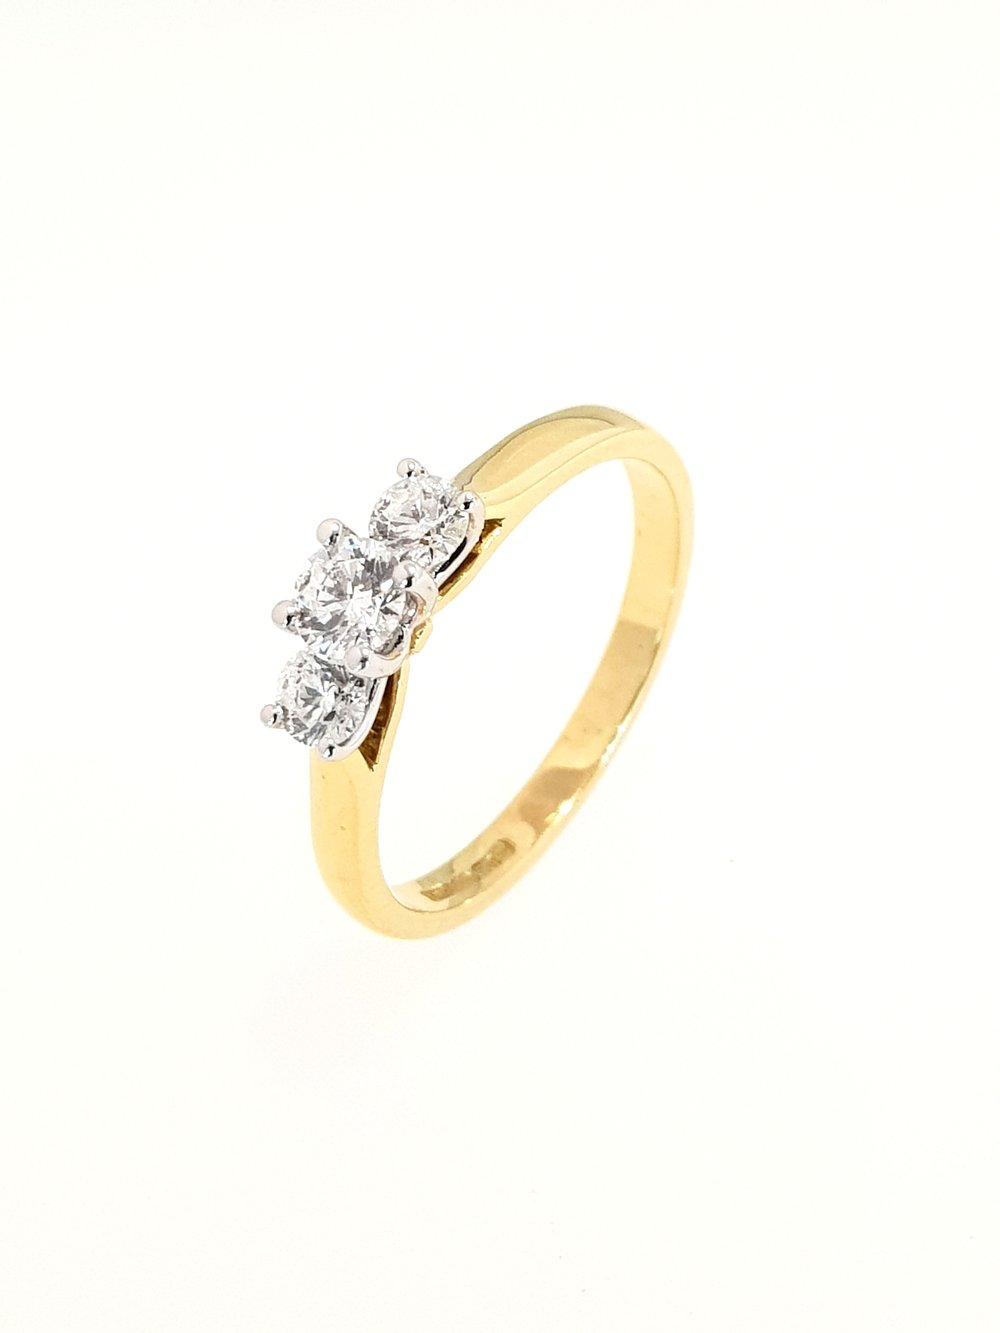 3 Stone Diamond Ring in Yellow Gold  .48ct, H, Si1  Stock Code: N8594  £1550